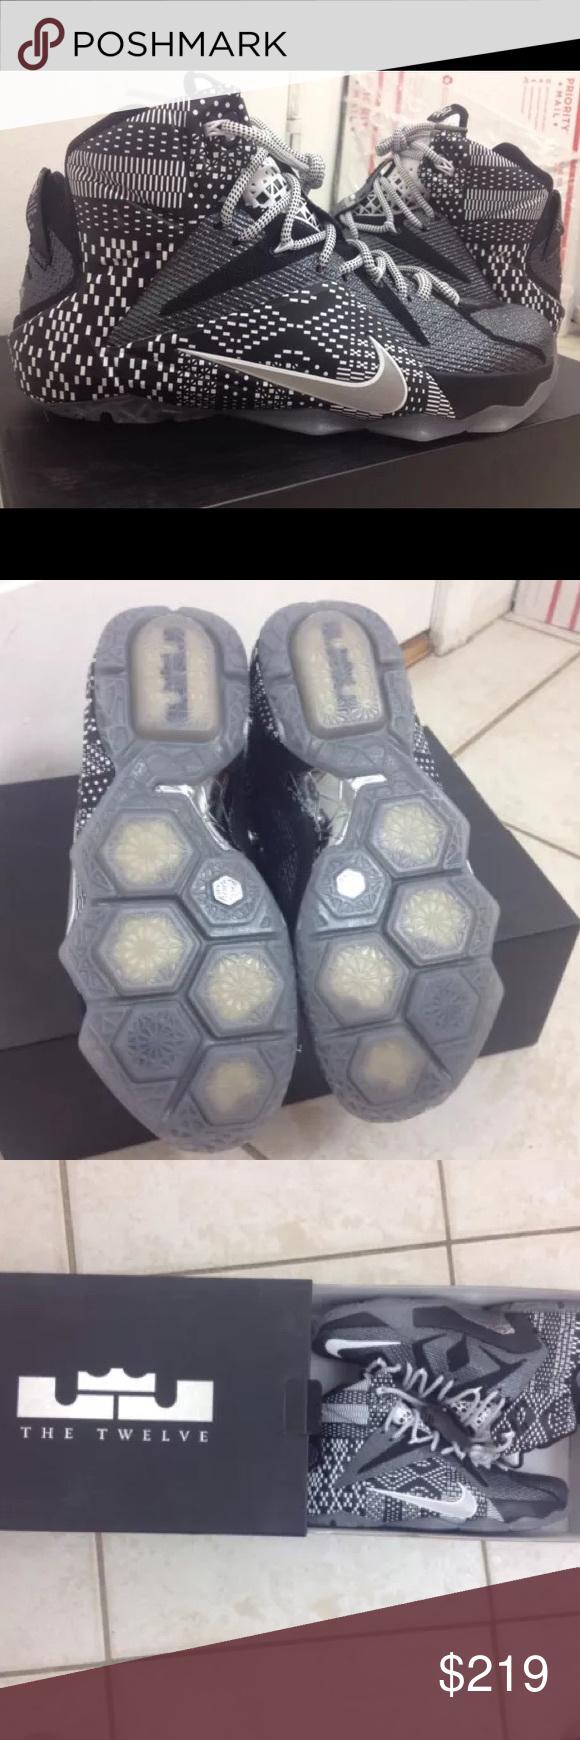 a303e0d4ab63 LeBron 12 BHM DS Size 8 Rare Basketball Shoes Brand new never worn rare LeBron  12